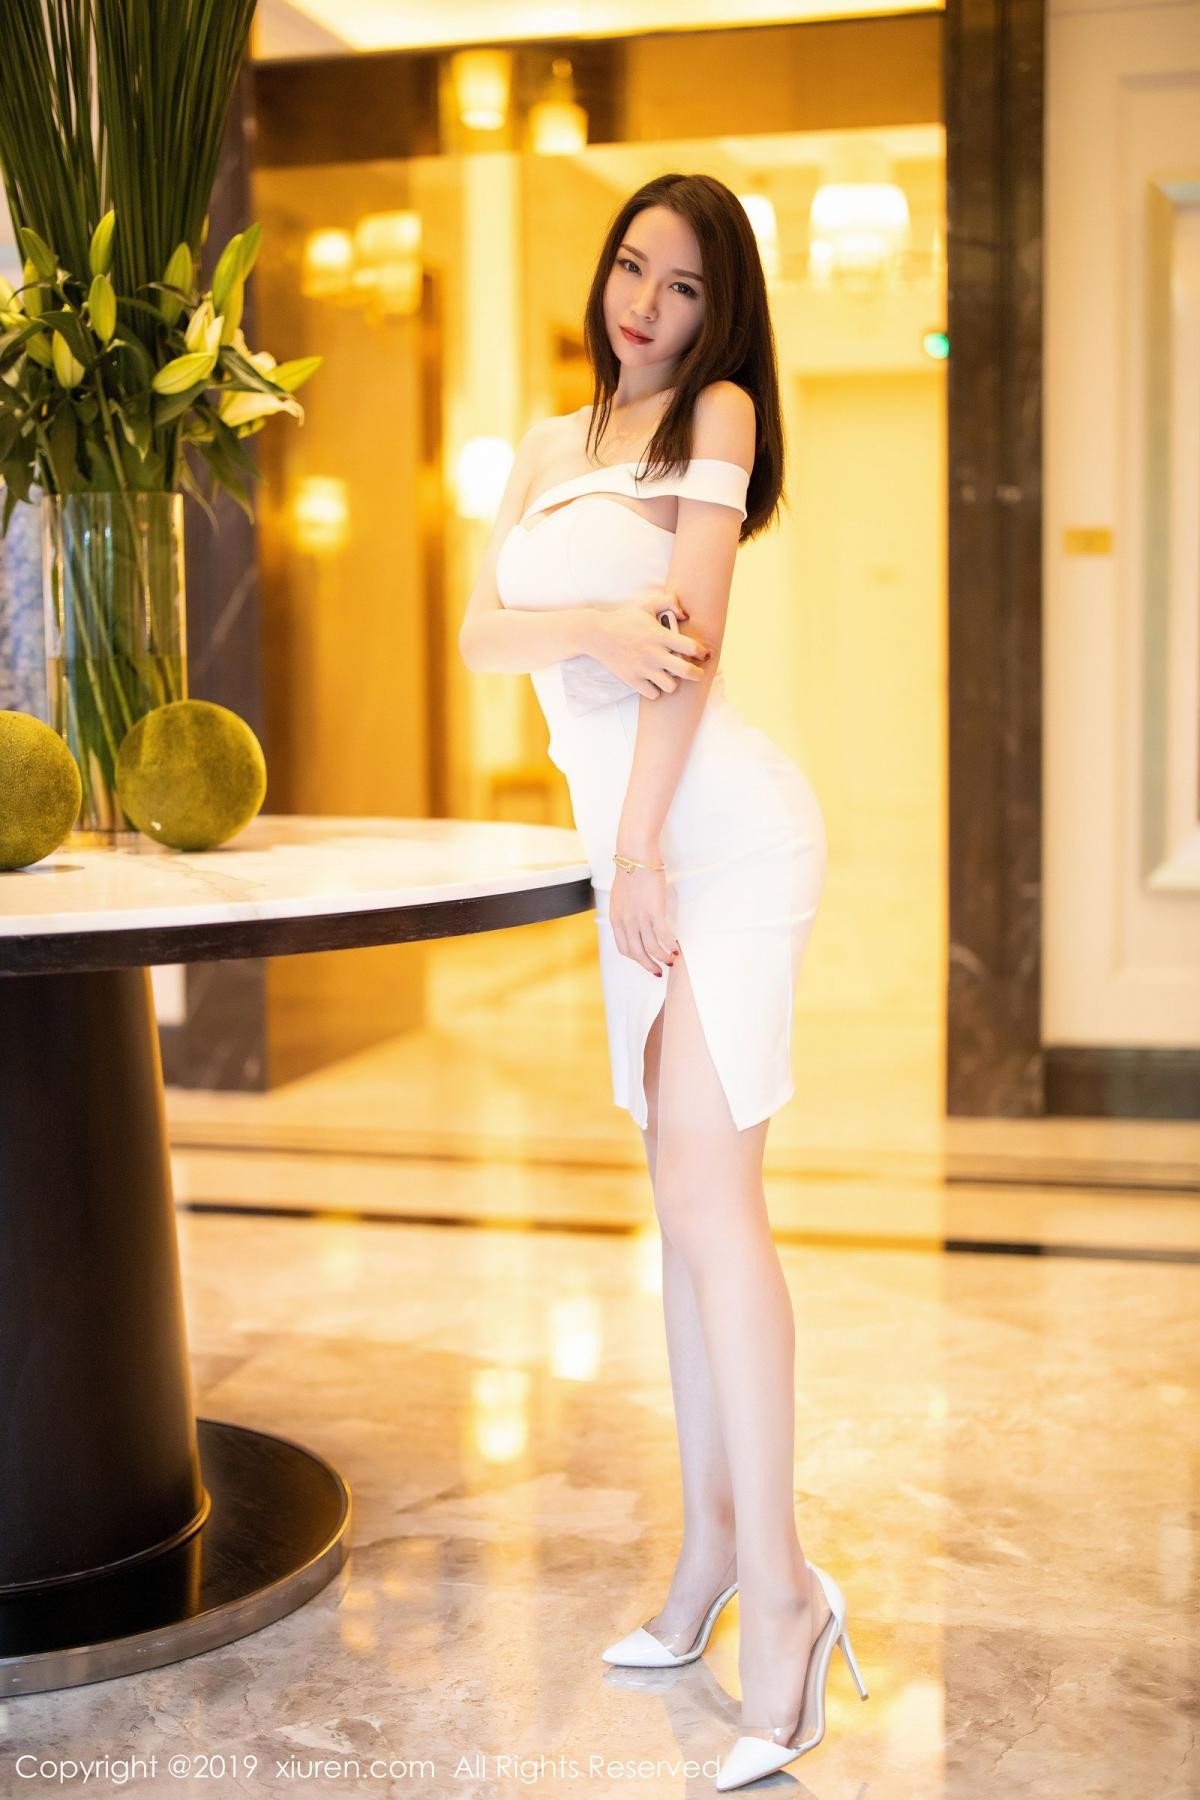 [XiuRen] Vol.1861 Meng Xin Yue 14P, Meng Xin Yue, Tall, Temperament, Uniform, Xiuren